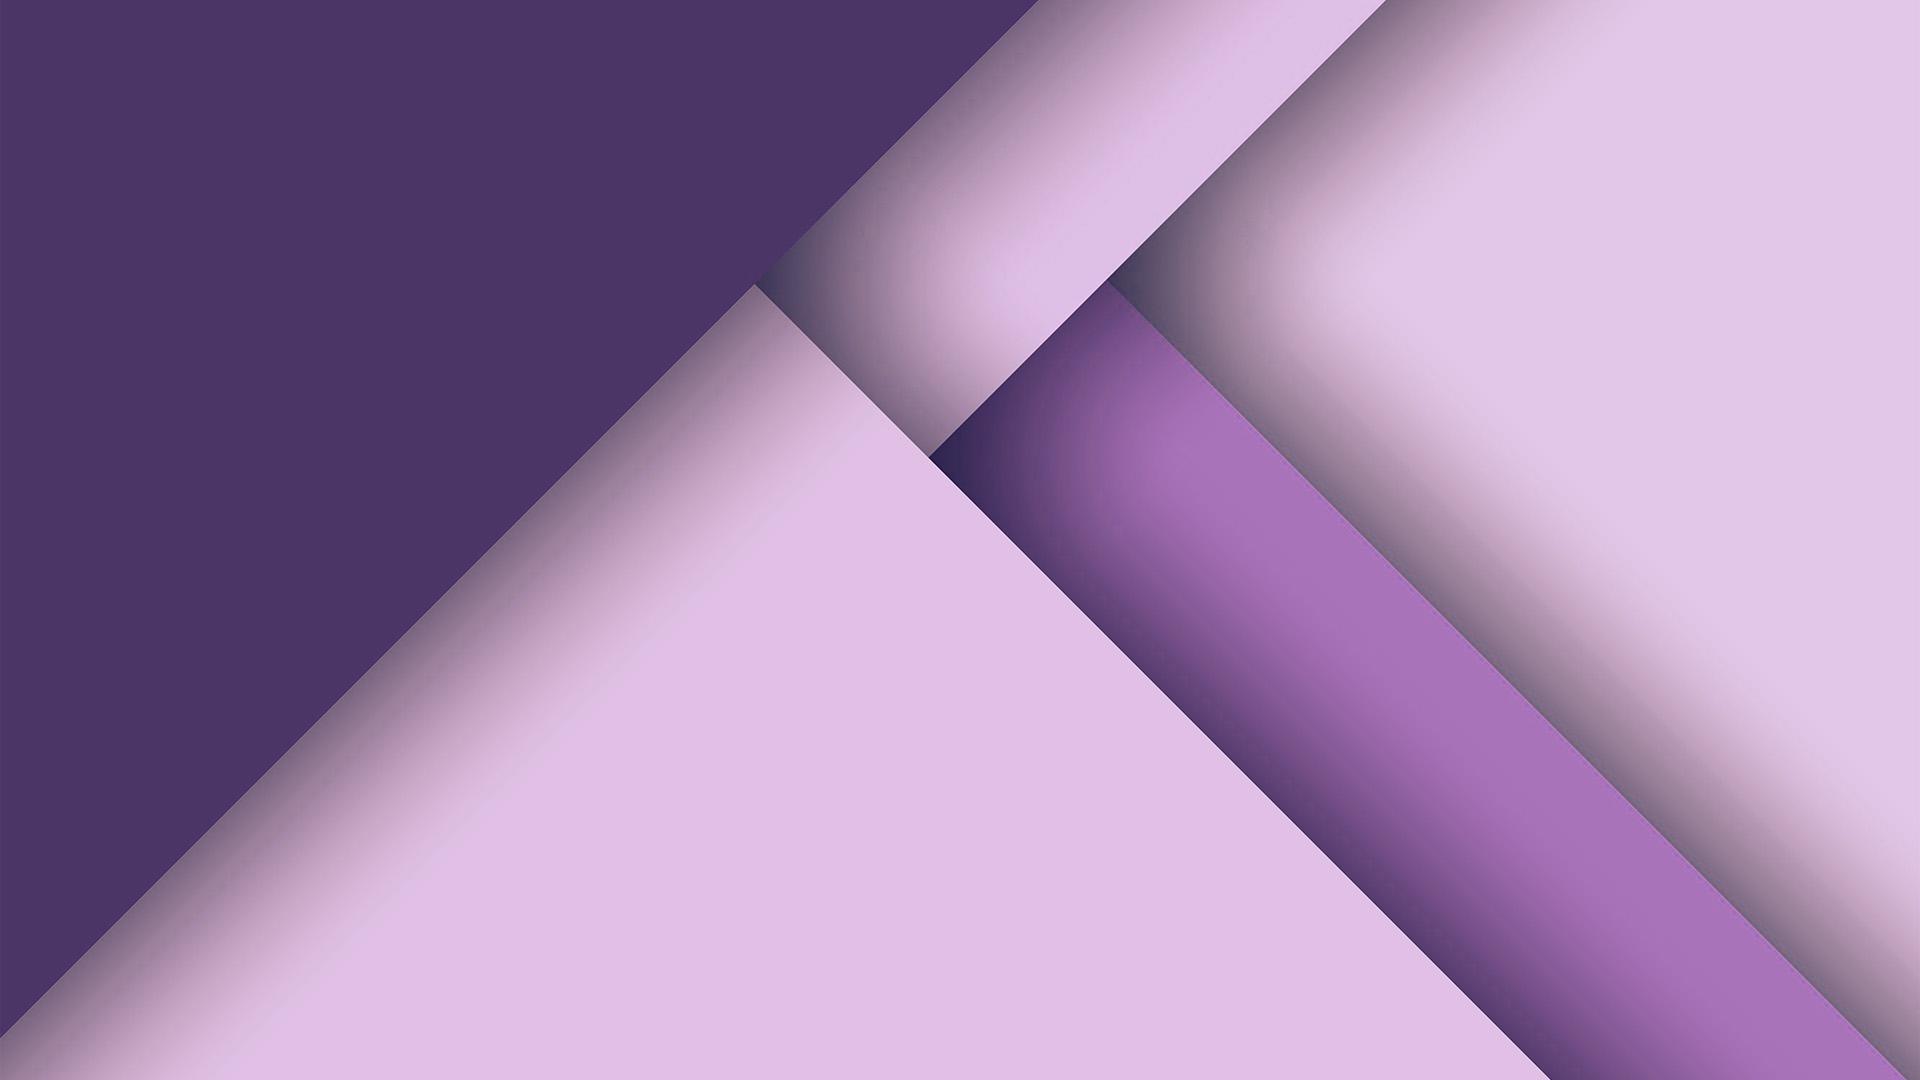 Neon Fall Wallpapers Vk87 Lollipop Background Purple Flat Material Pattern